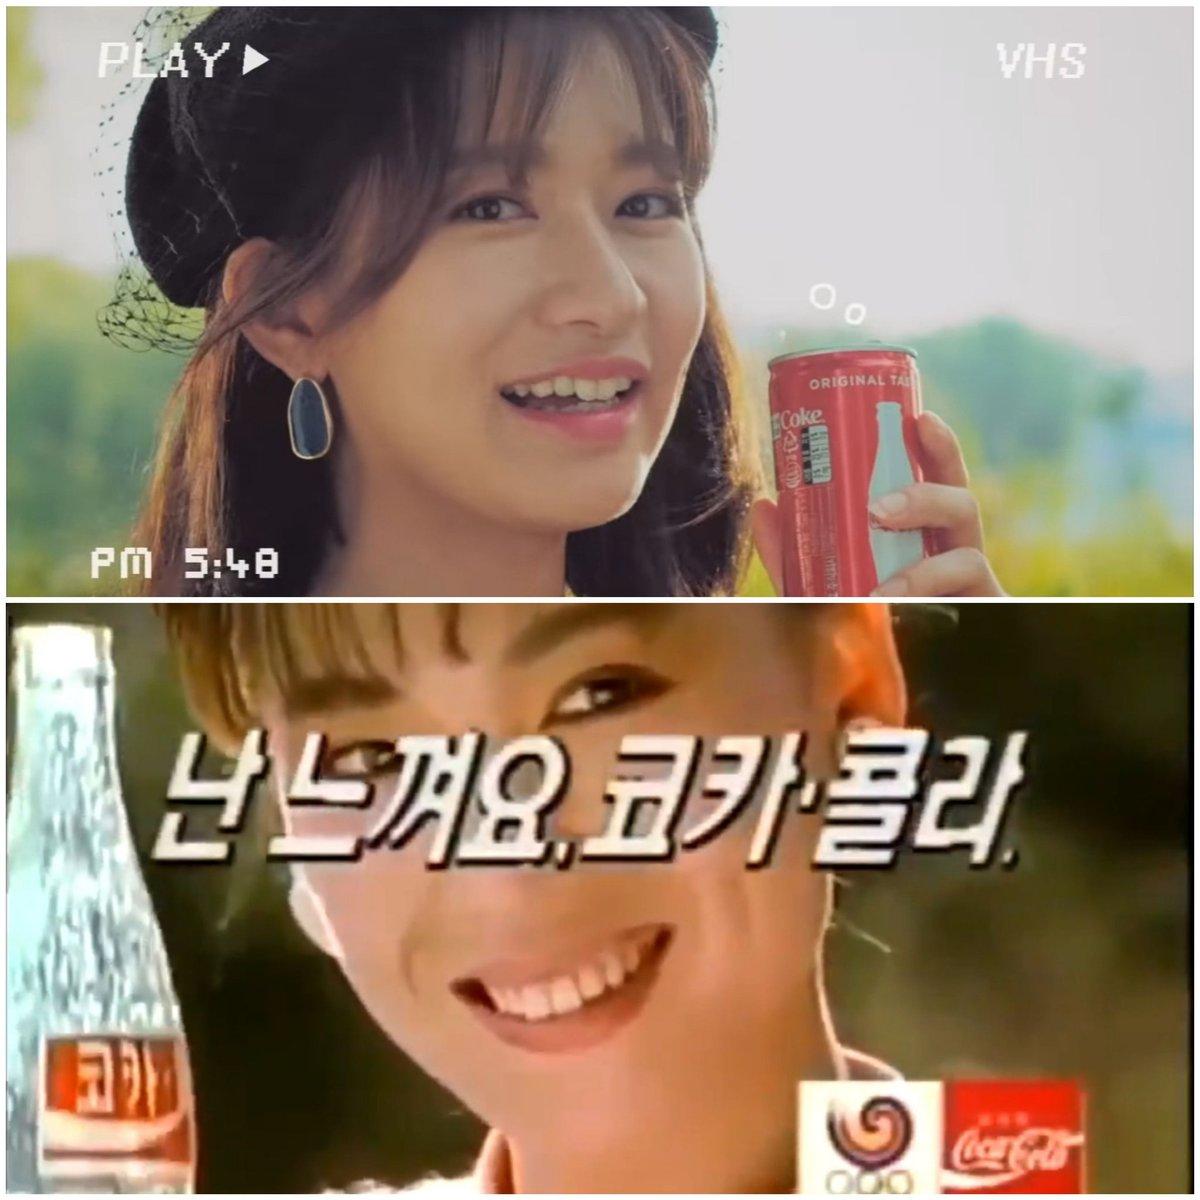 Loona World Domination On Twitter For Us Uncultured Swine Miyu S Mv Was Actually Referencing 80s 90s Korean Ads Takeuchimiyu Ç«¹å†…美宥 ̓€ì¼€ìš°ì¹˜ë¯¸ìœ Uncultured swine johnny and gsv. twitter